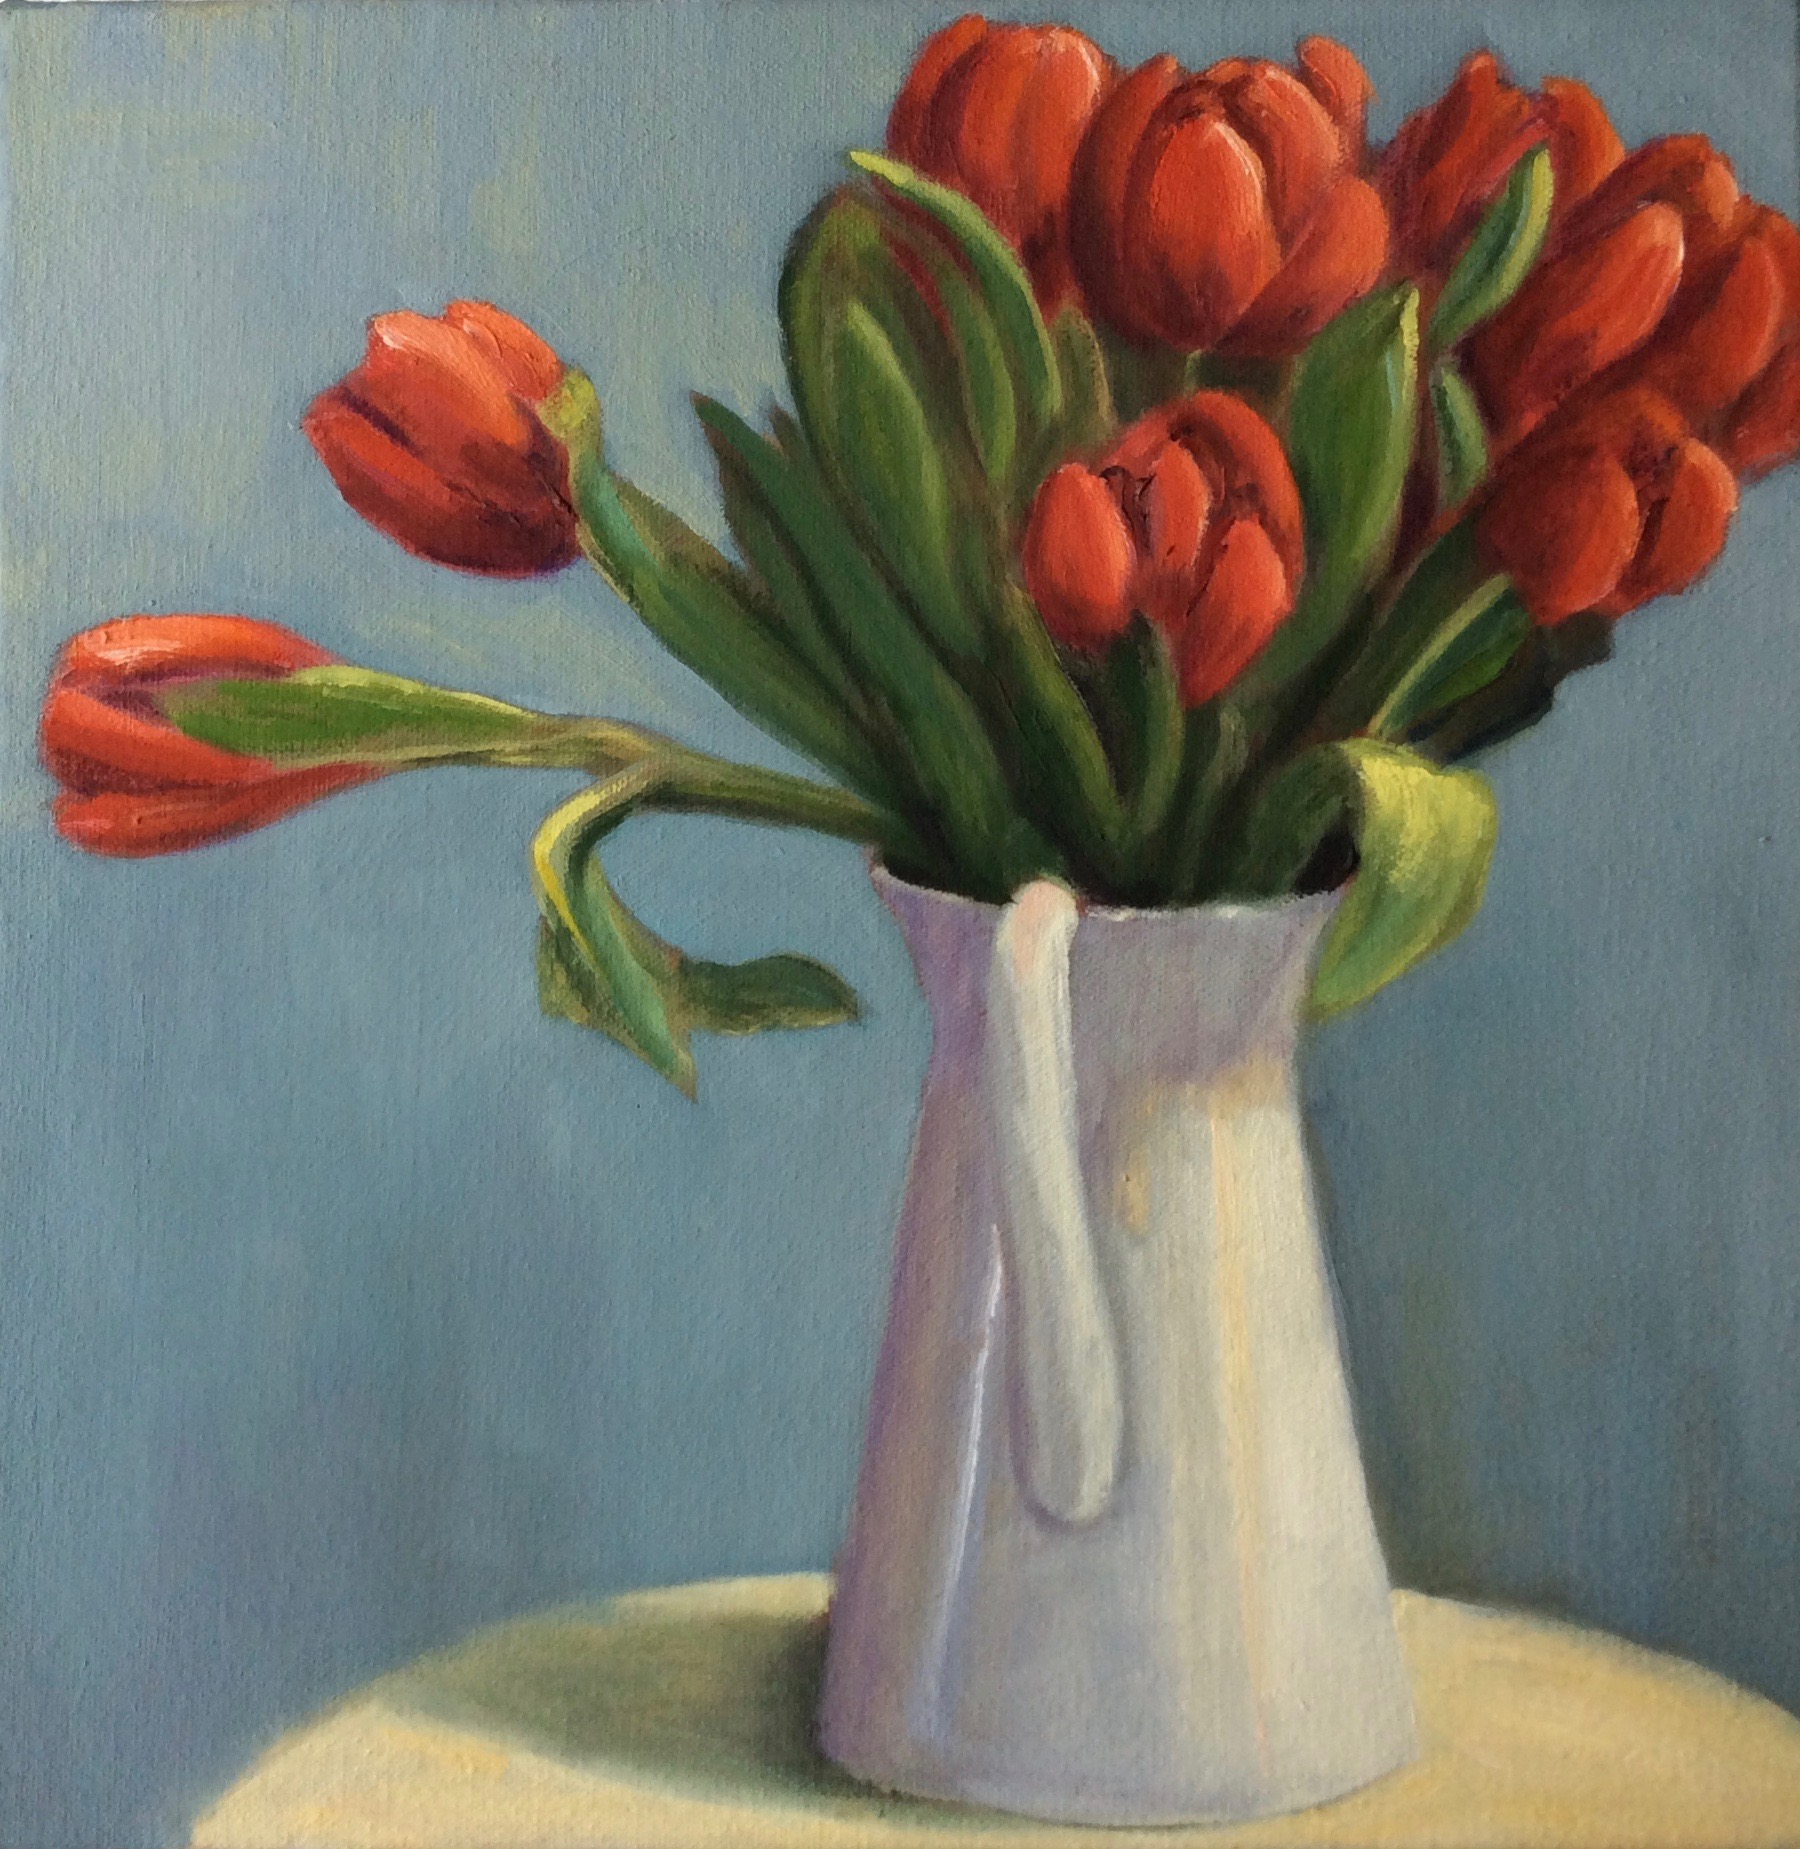 Yuletide Tulips